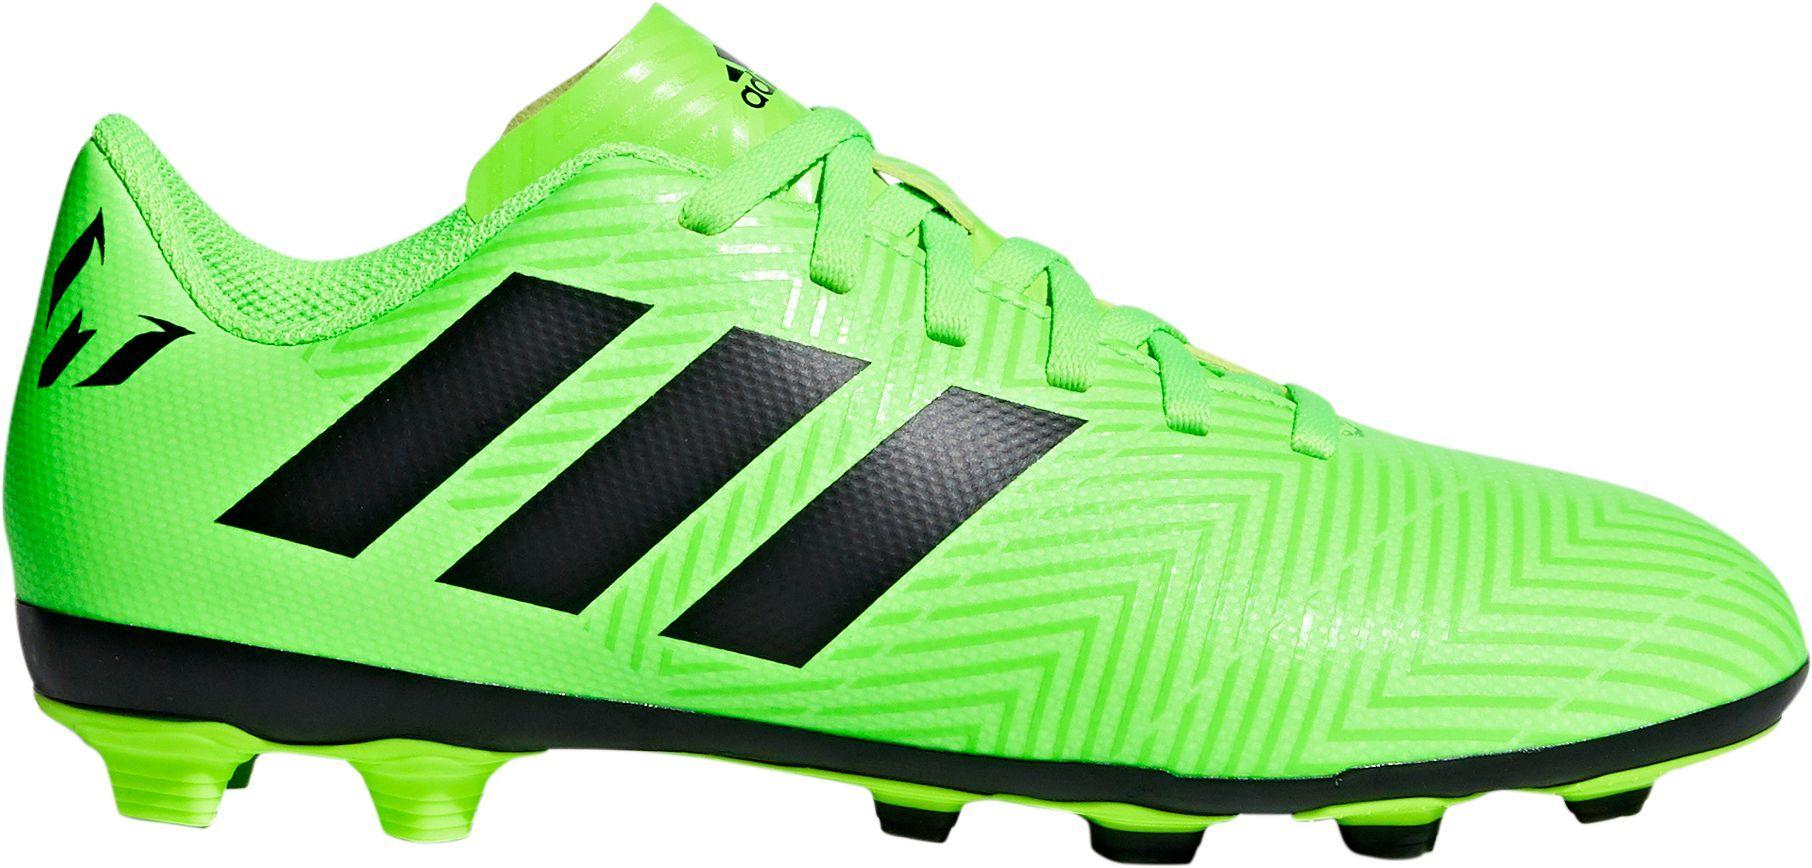 a851fb8ceb42f adidas Kids  Nemeziz Messi 18.4 FXG Soccer Cleats